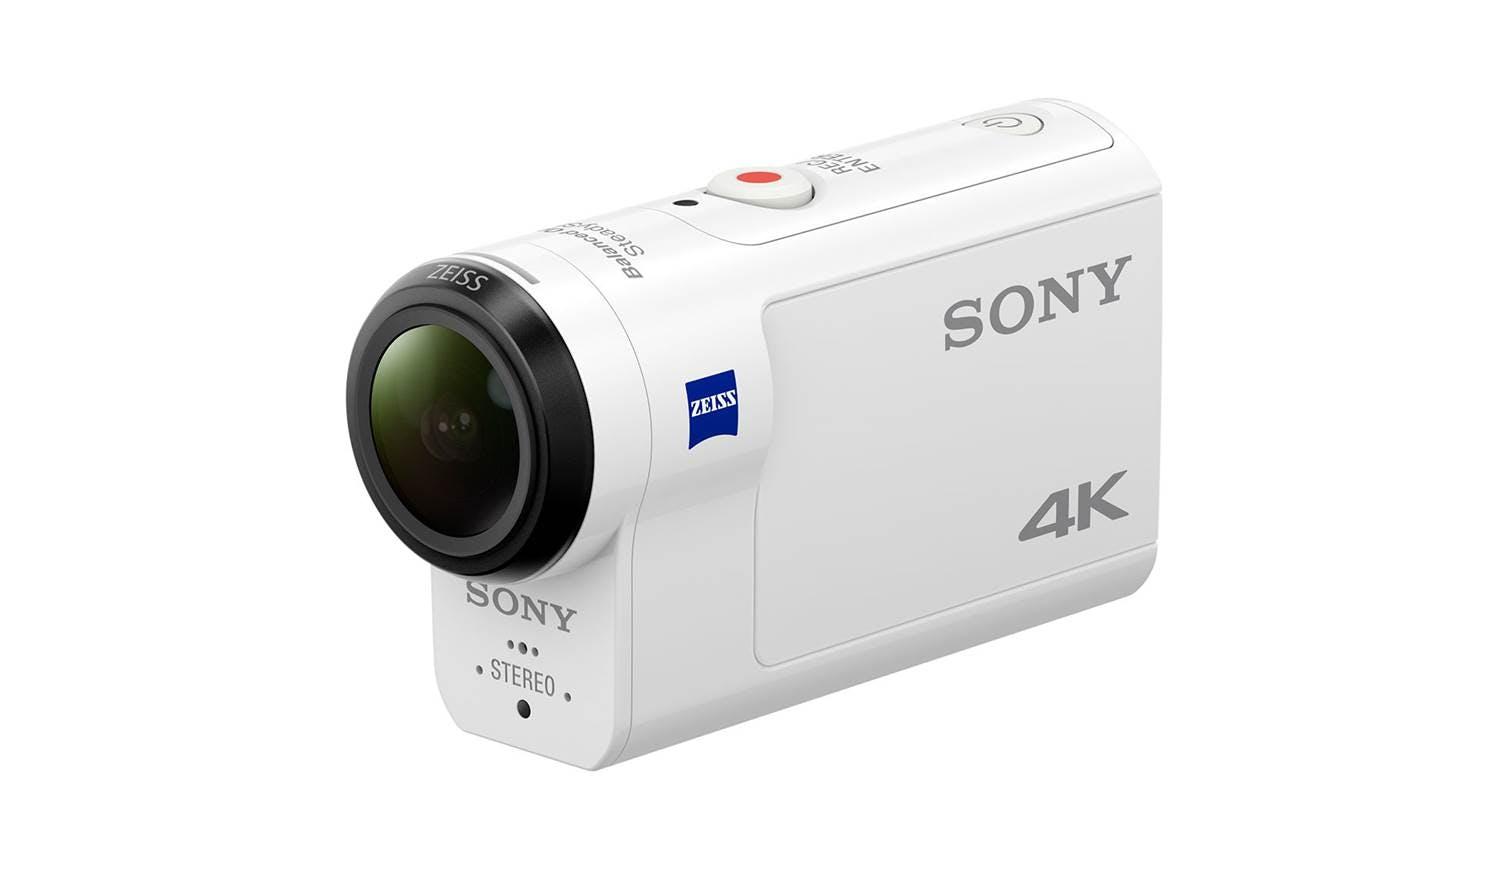 Camera Sony Action Cam Waterproof Case sony fdr x3000 4k action camera with waterproof case harvey case